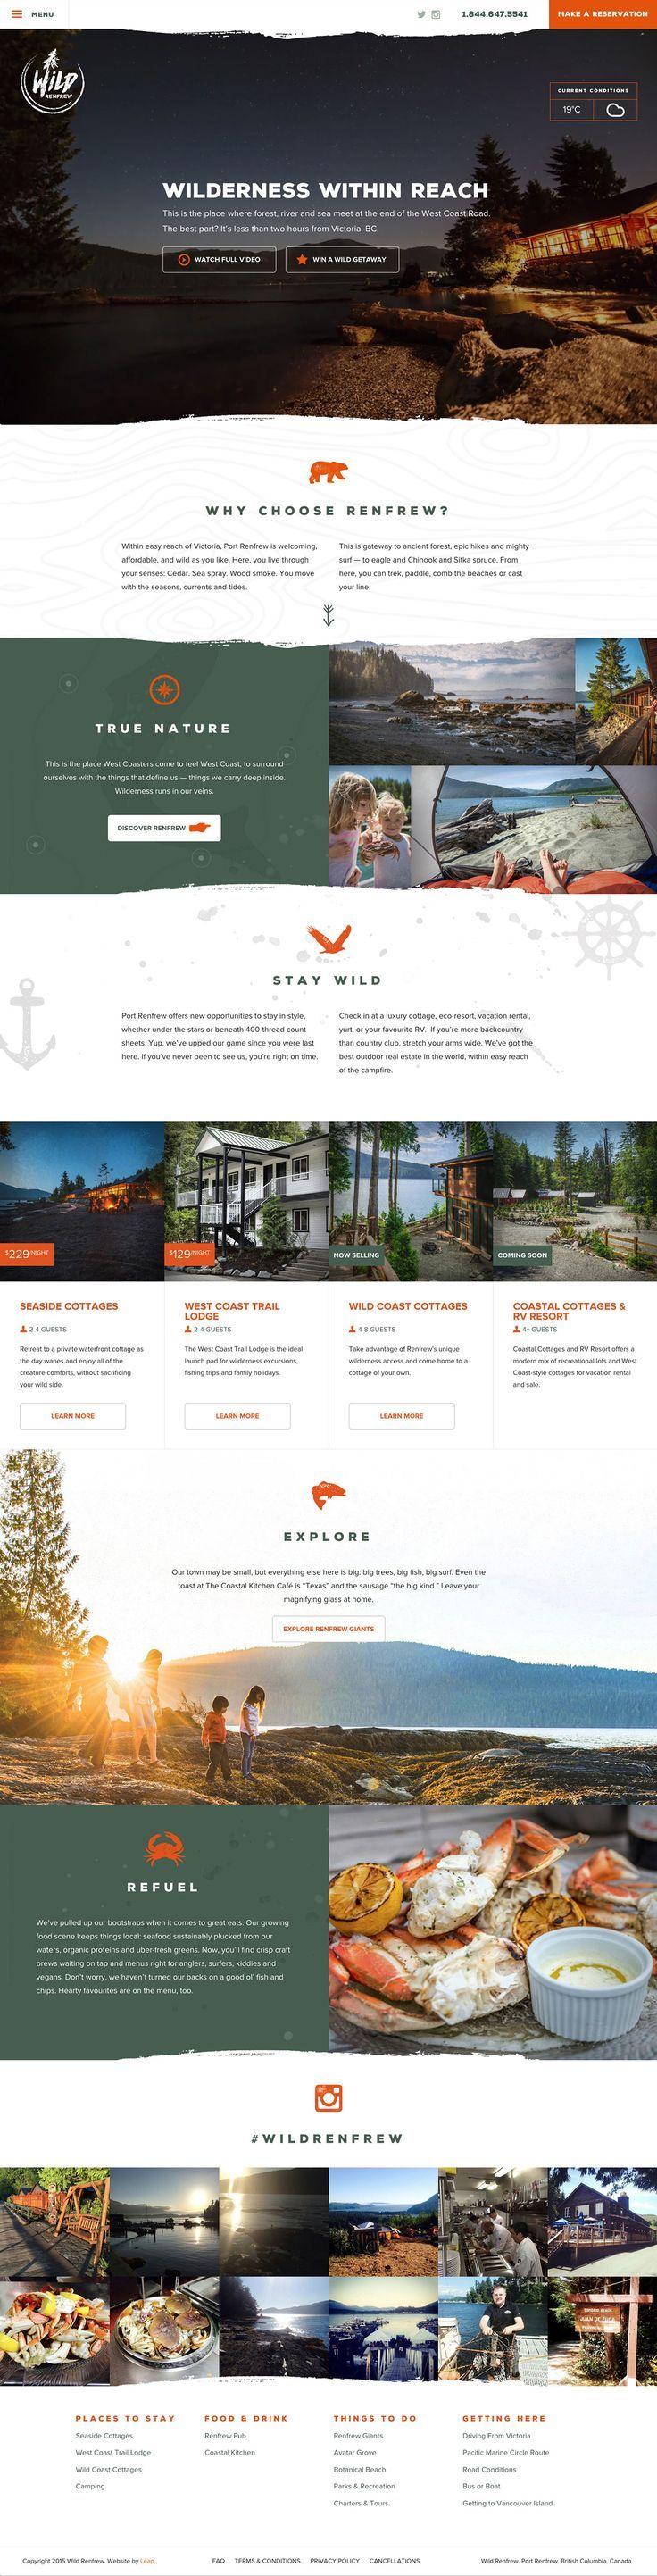 Wild Renfrew Website Design on Behance